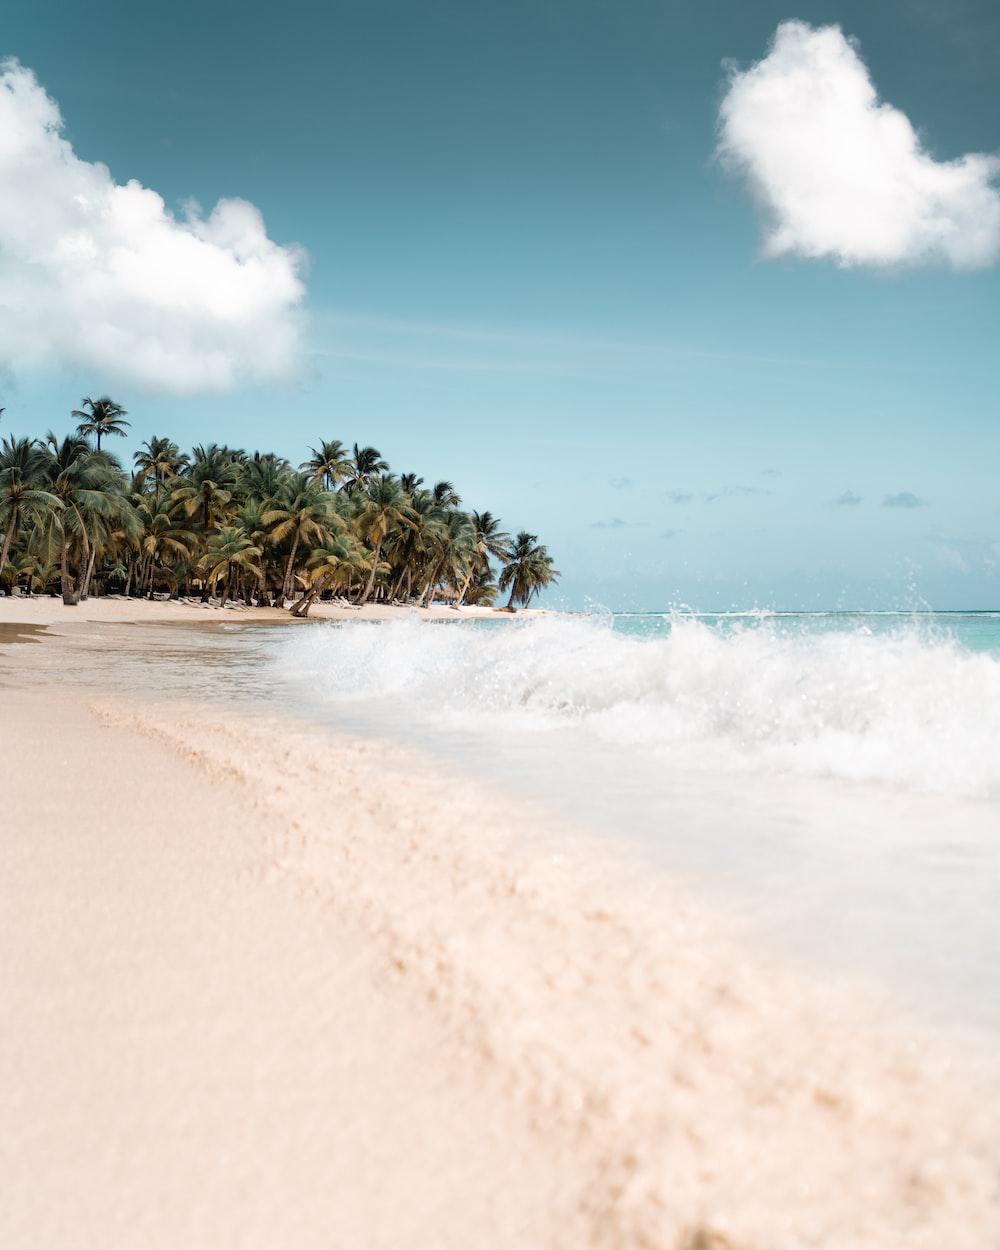 long exposure photography of beach